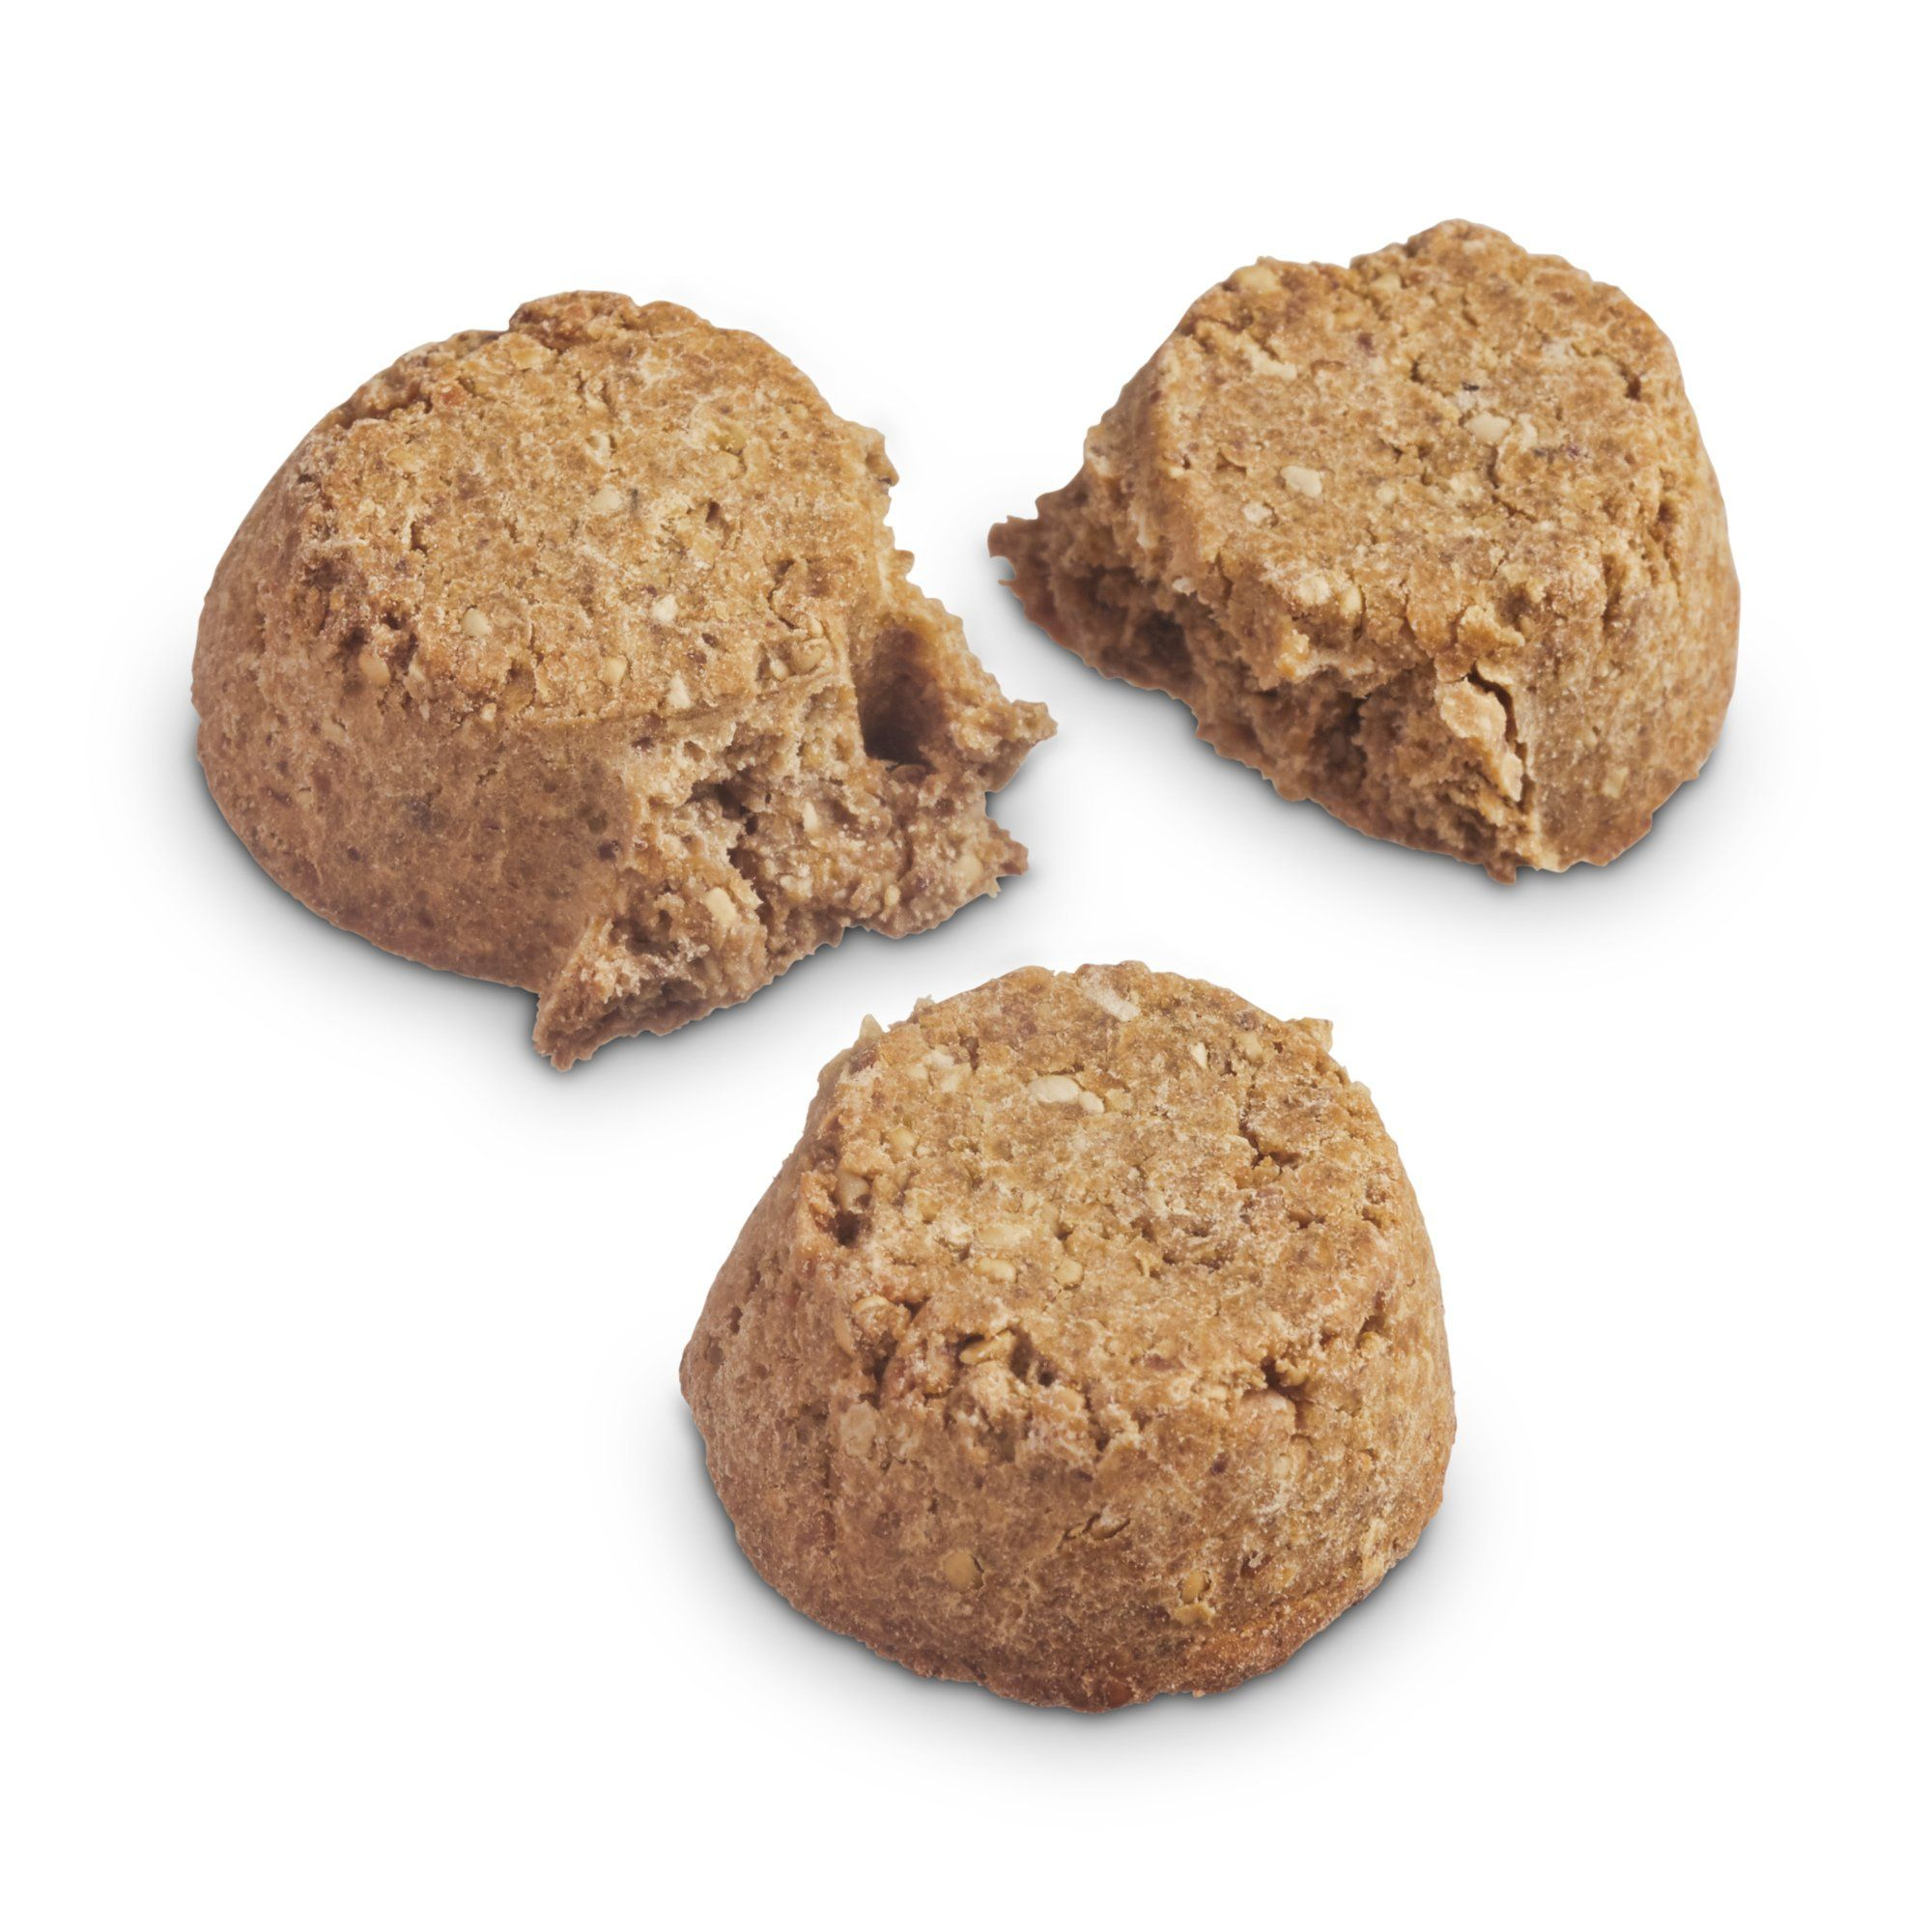 Wholehearted Grain Free Peanut Butter Dog Treats 10 Oz Peanut